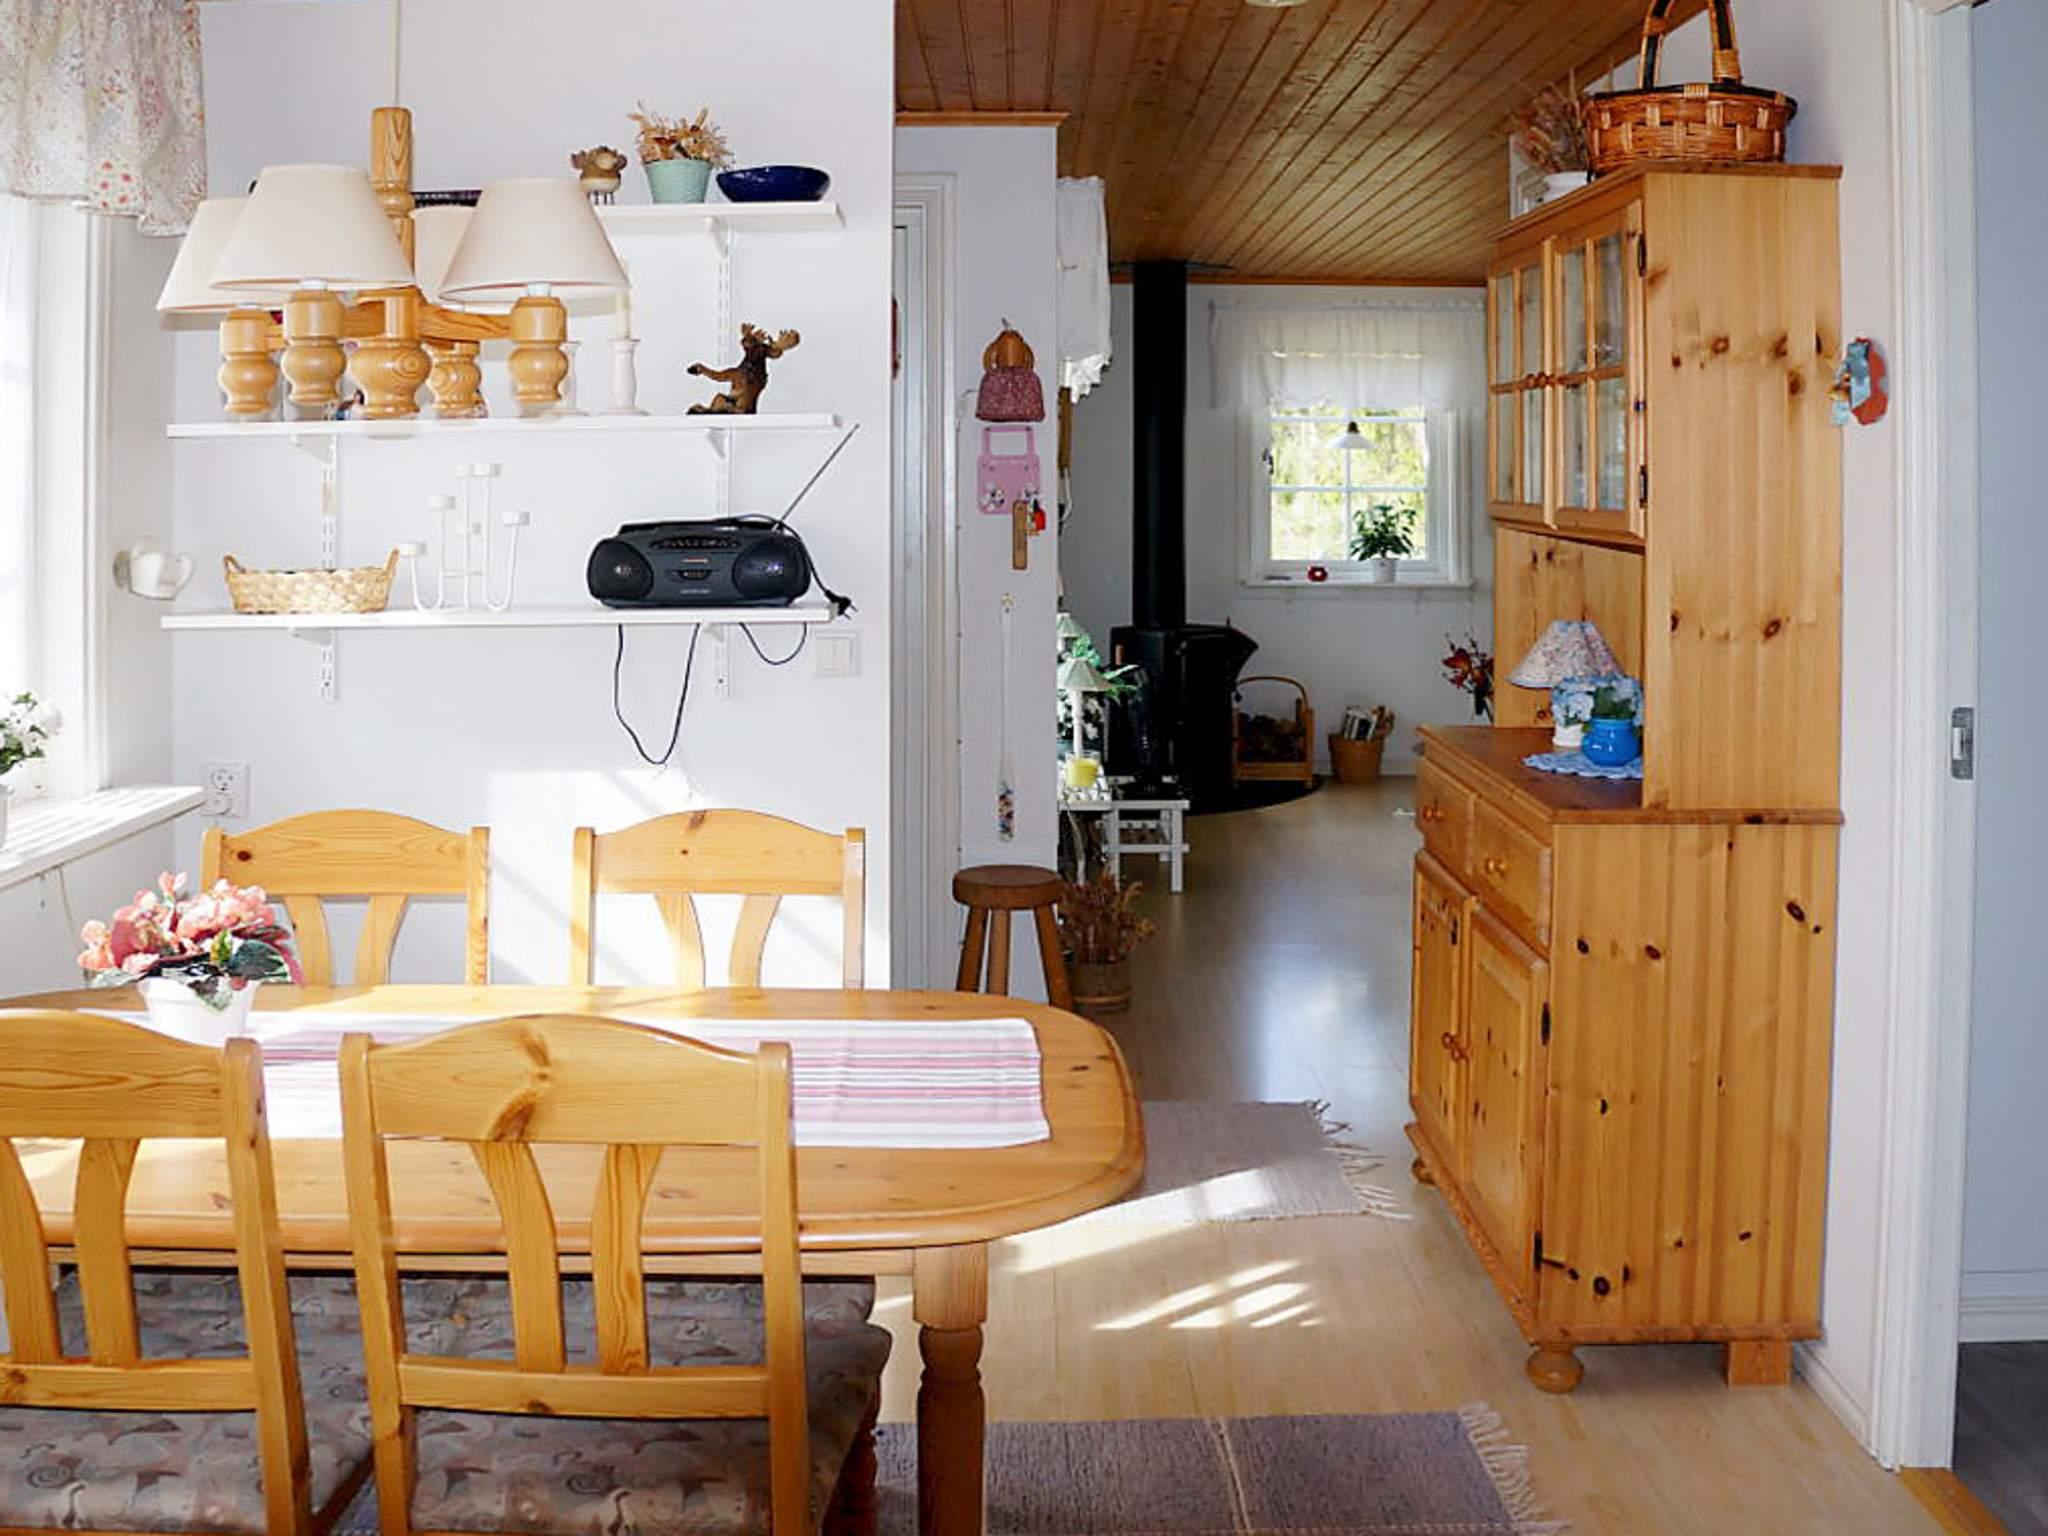 Ferienhaus Valdemarsvik (84743), Valdemarsvik, Östergötlands län, Südschweden, Schweden, Bild 5